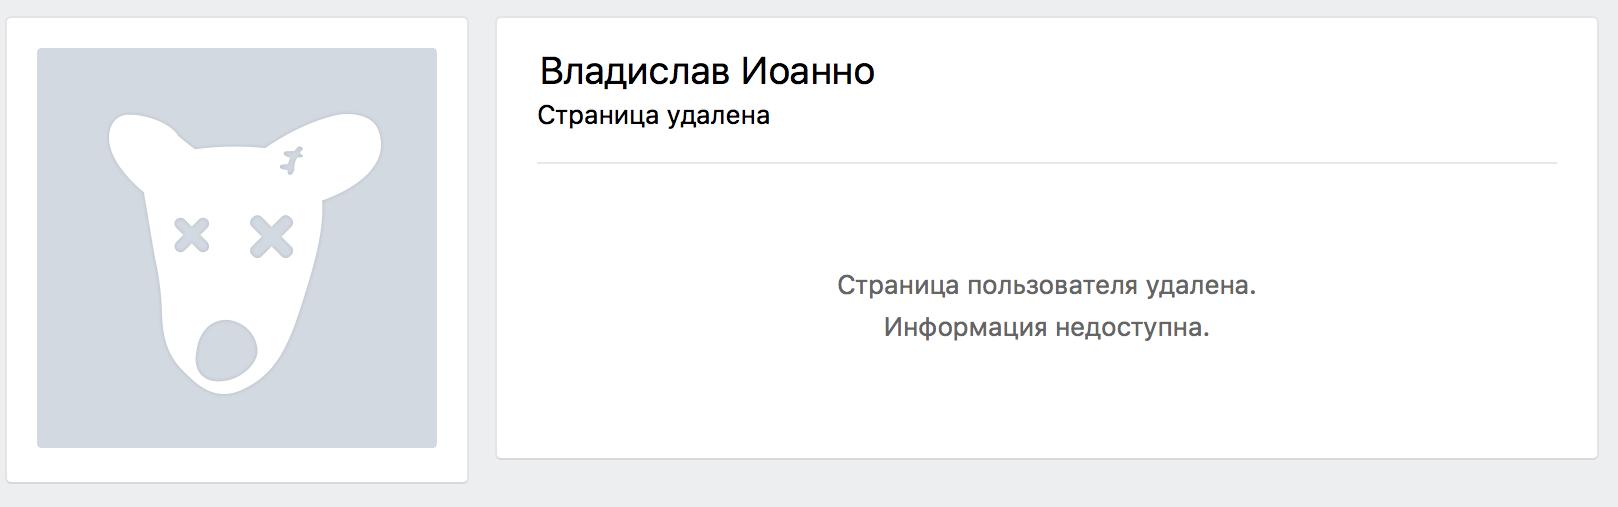 Картинка вконтакте страница удалена прикол, самых